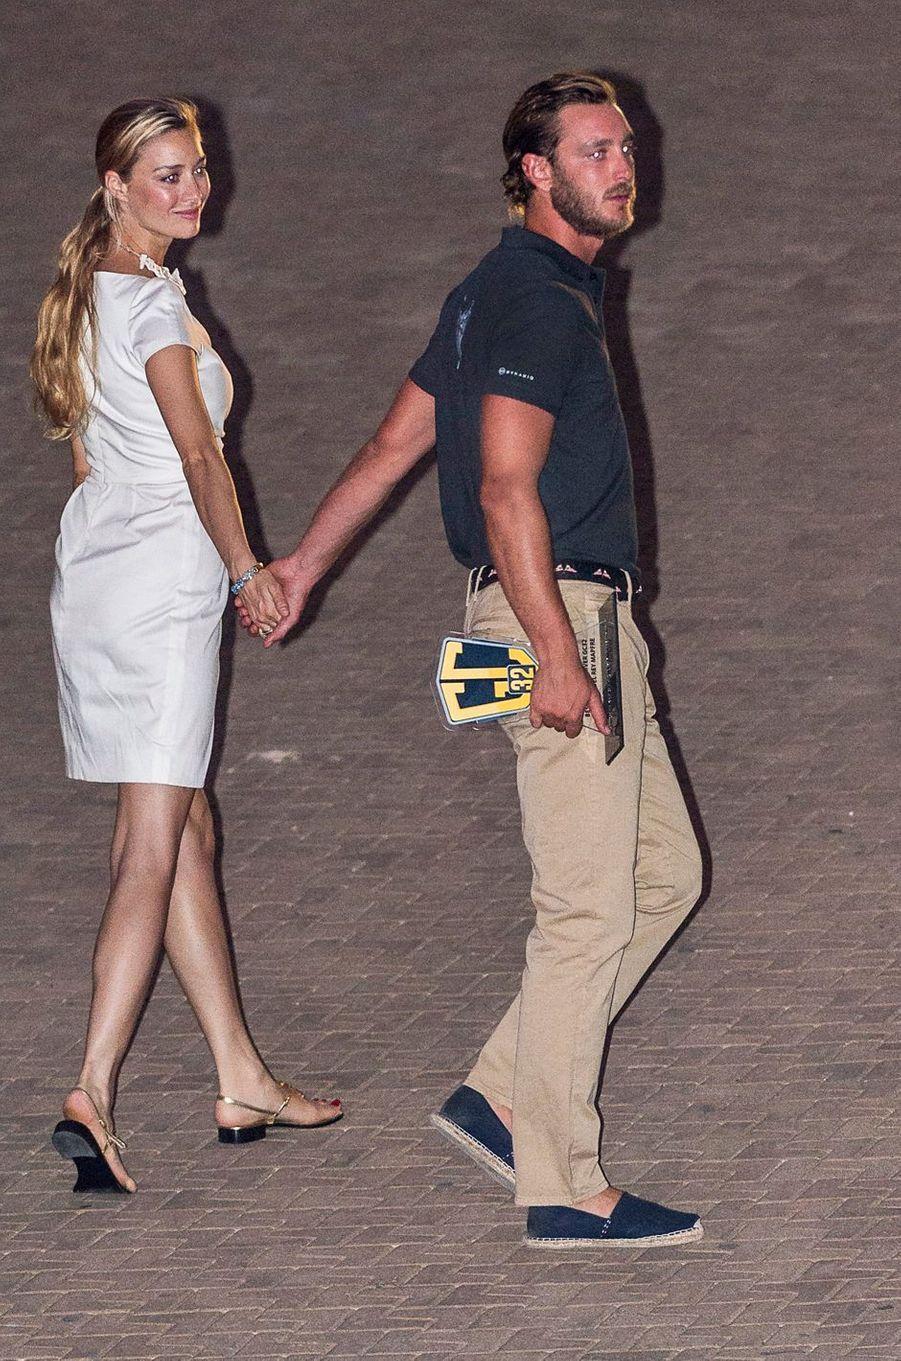 C'est vêtue de blanc que la ravissante Beatrice Borromeo est venue soutenir son mari, Pierre Casiraghi, lors de la Copa del Rey à Palma de Majorque, ce samedi 6 août.